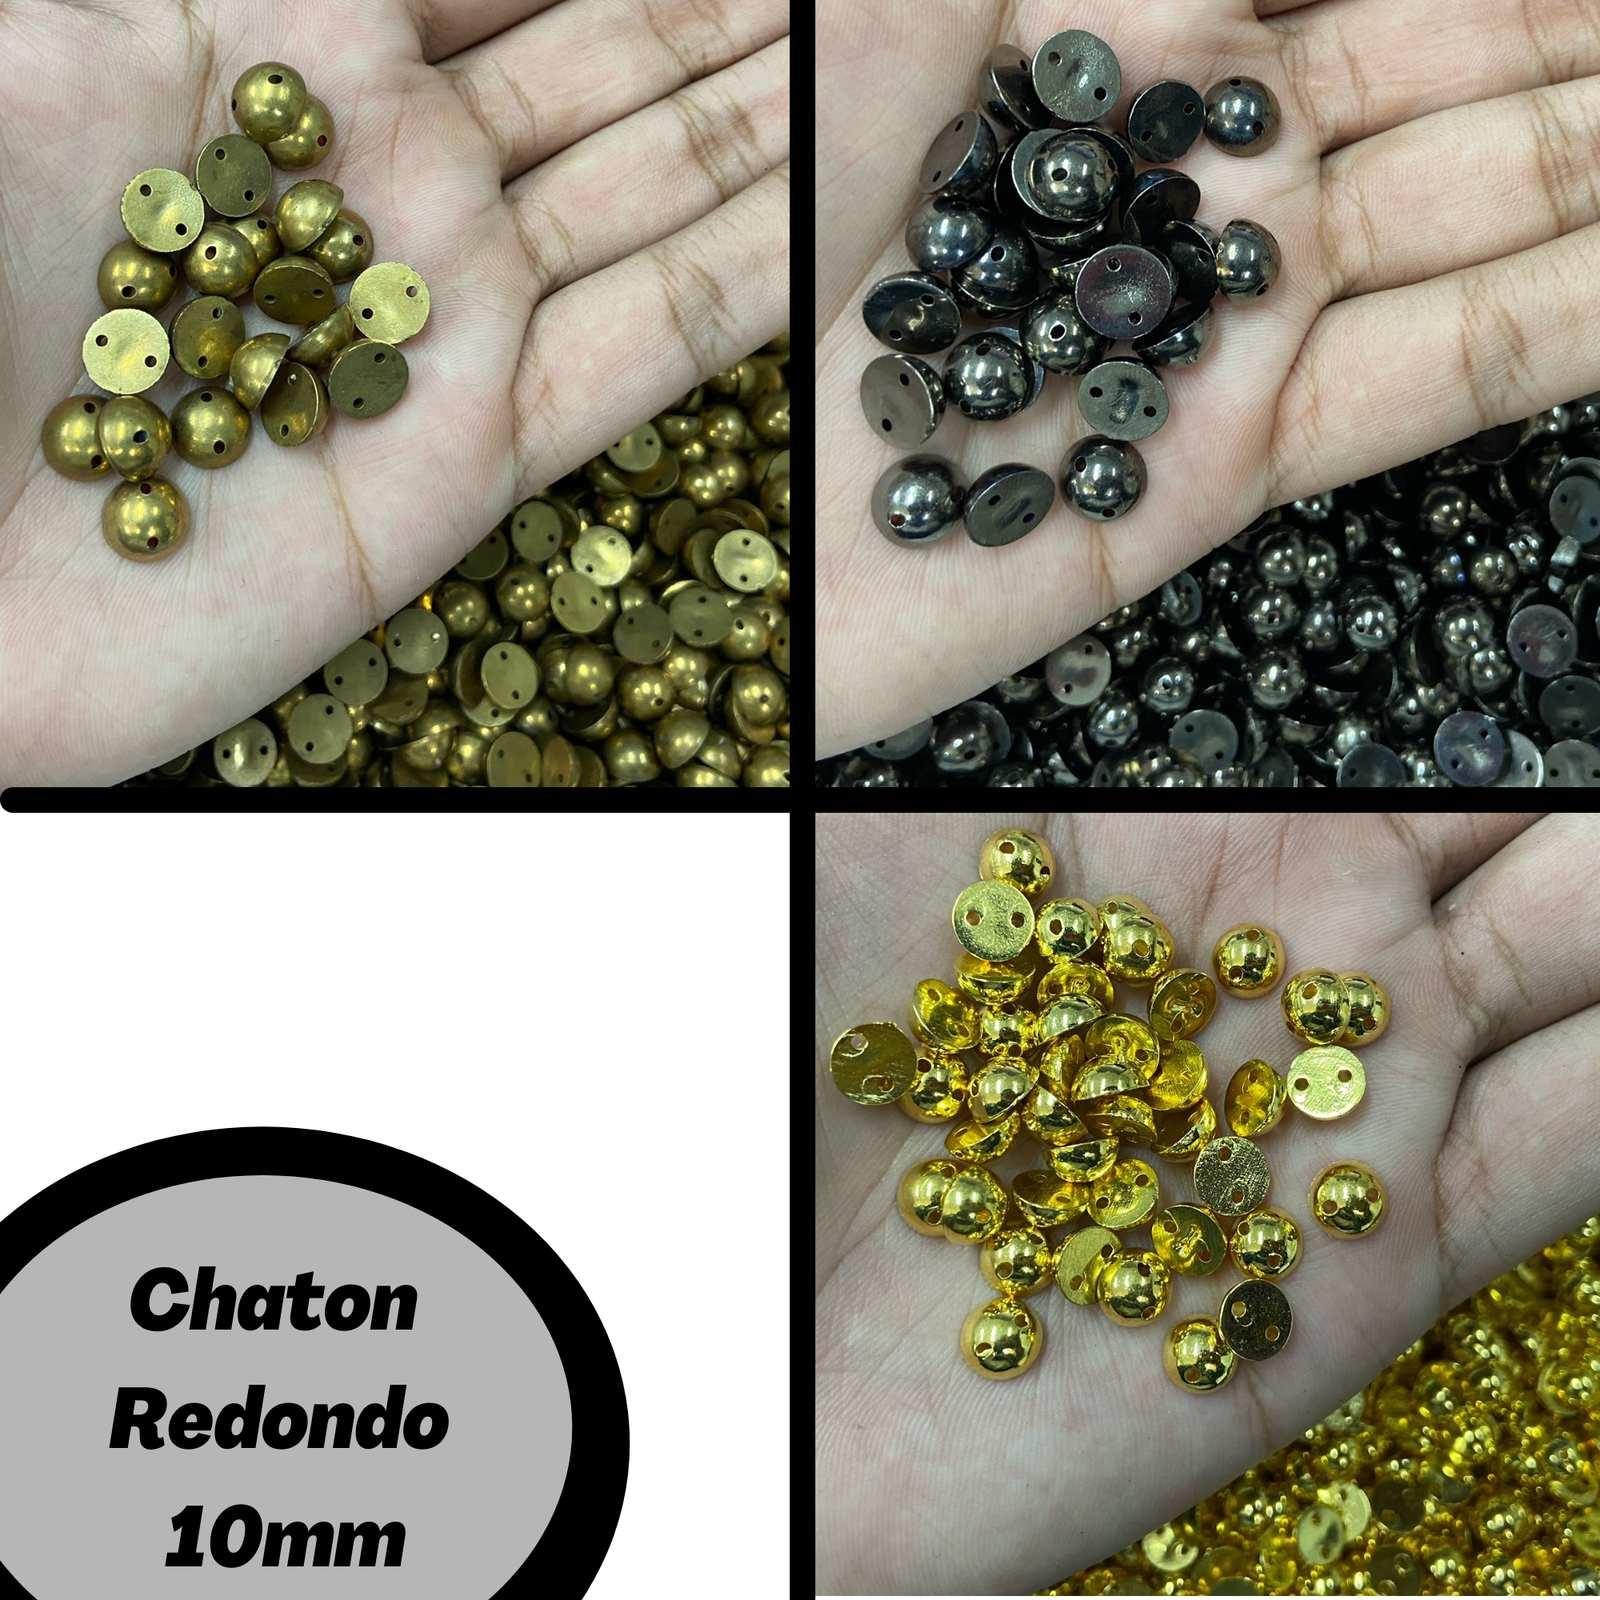 Chaton ABS Redondo 10mm C/250g